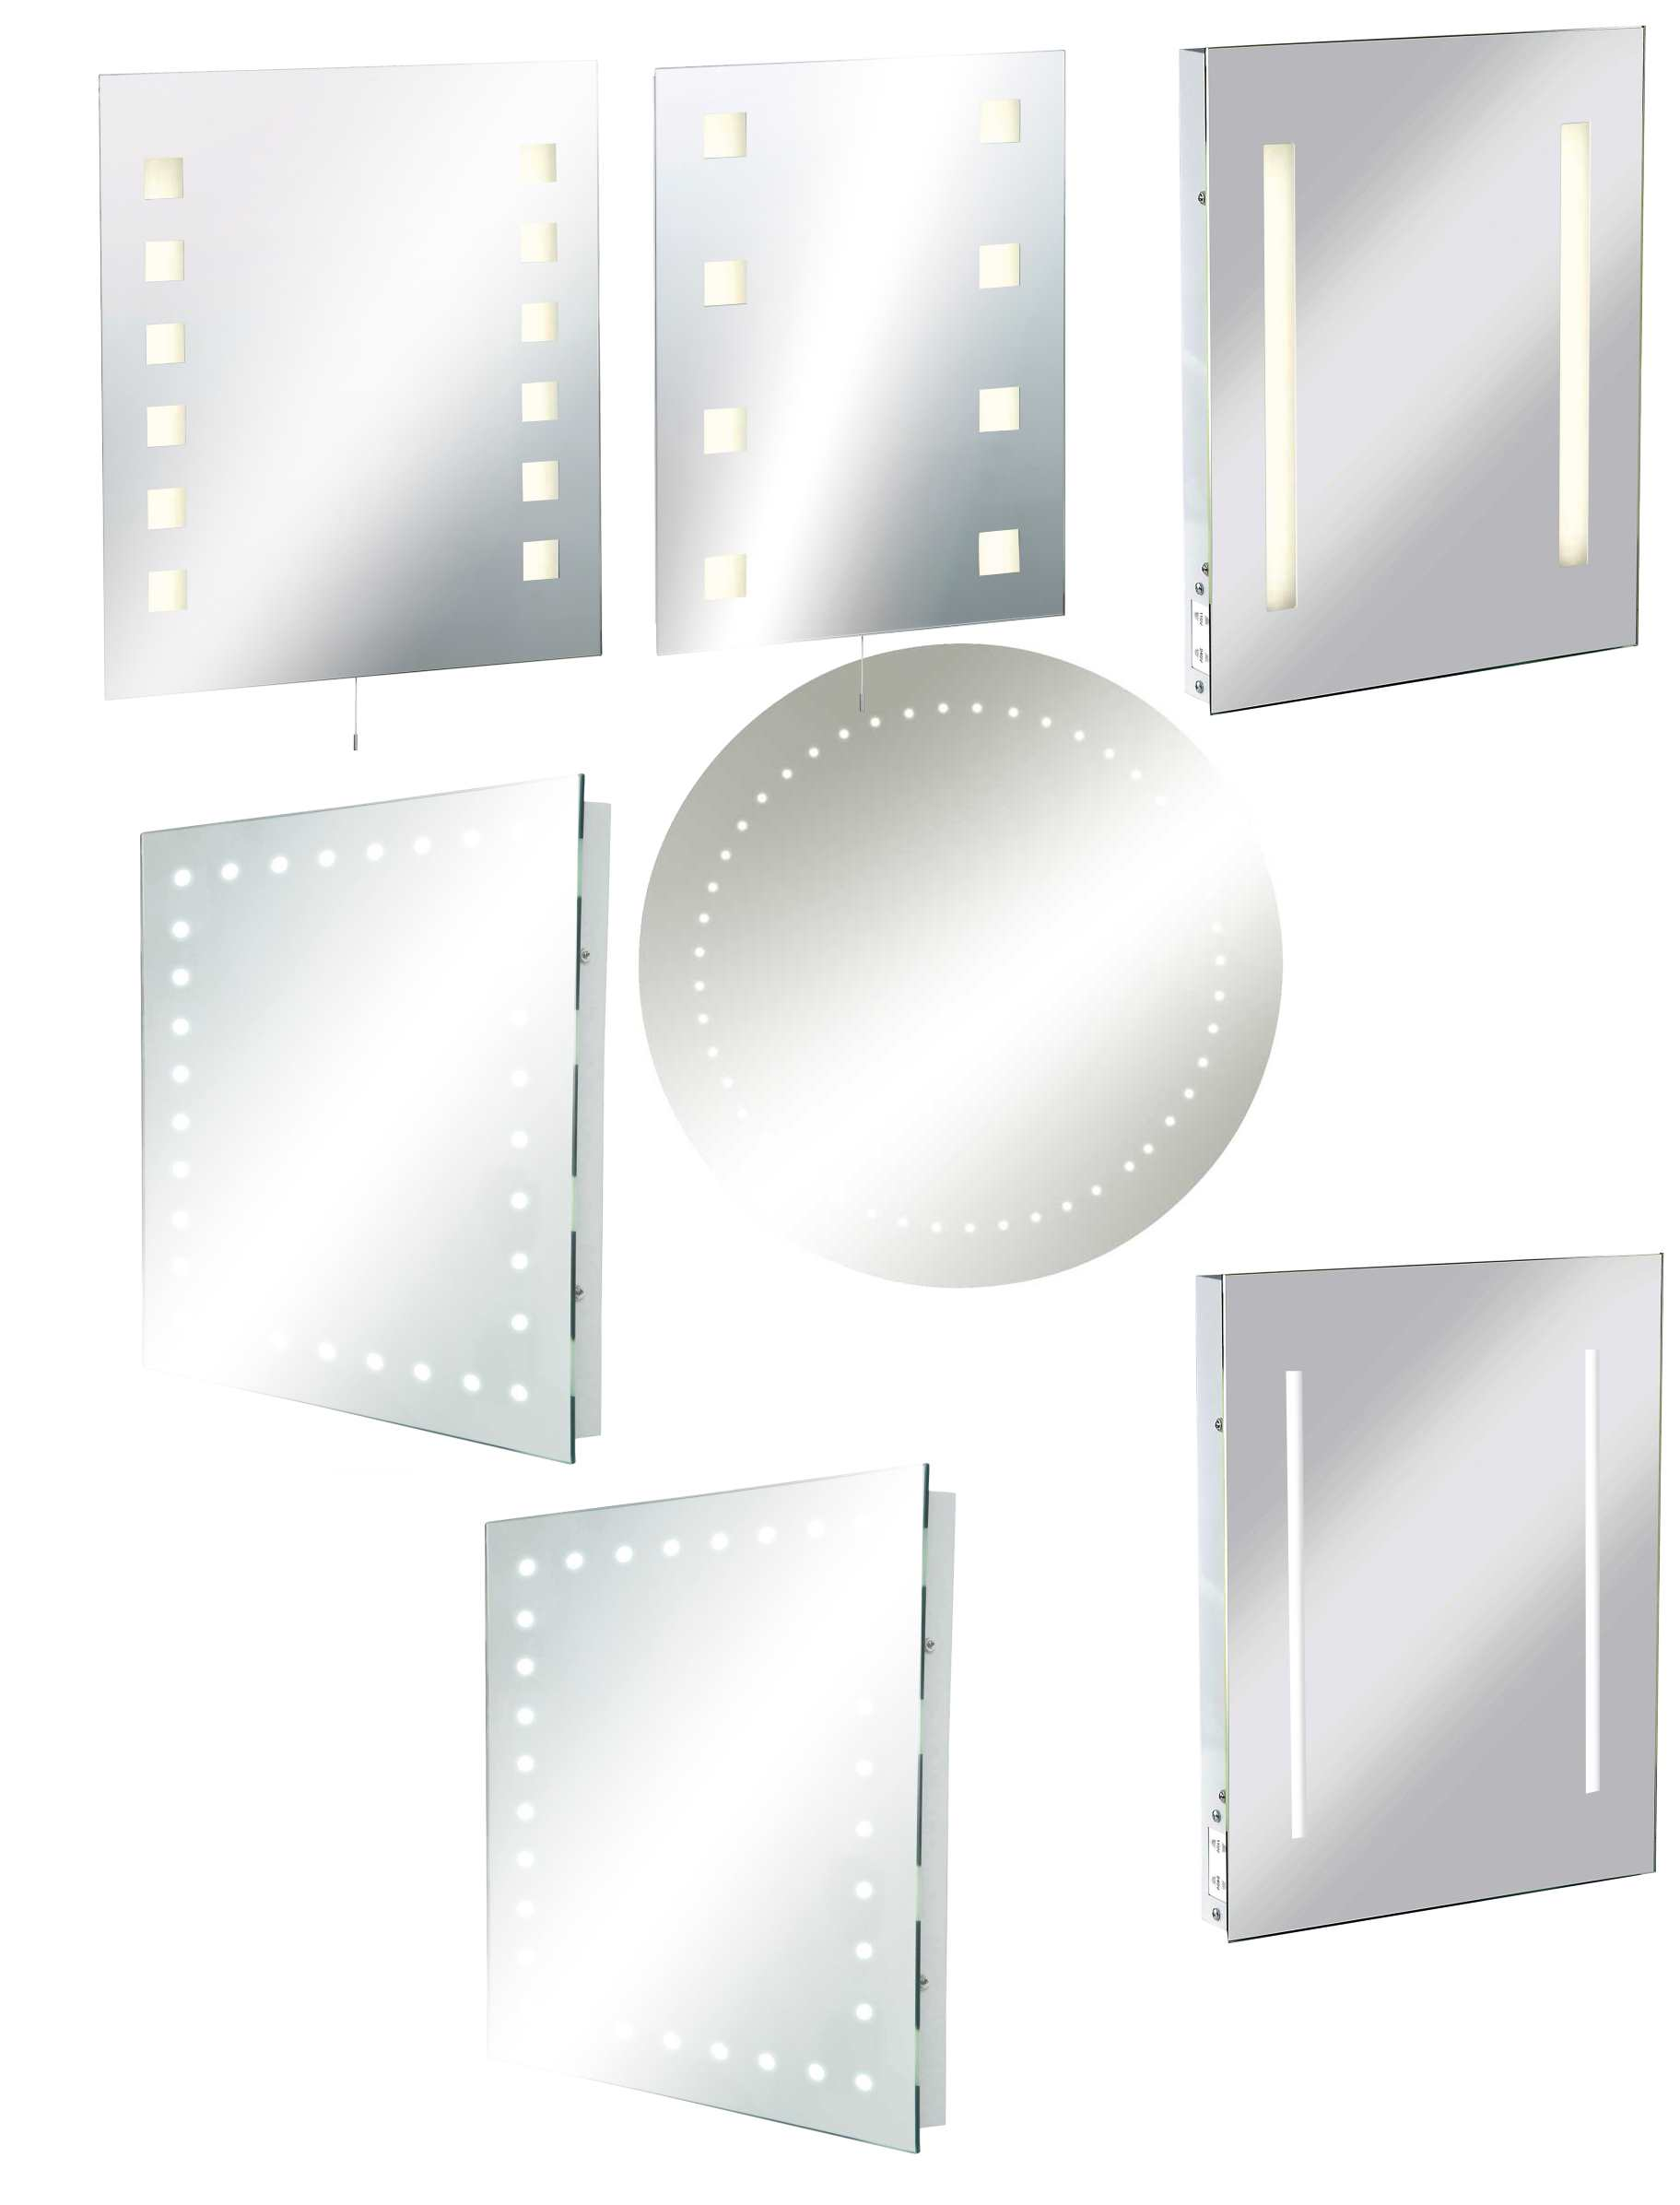 Cheap Illuminated Bathroom Mirrors: Knightsbridge Illuminated Bathroom Mirrors Standard With